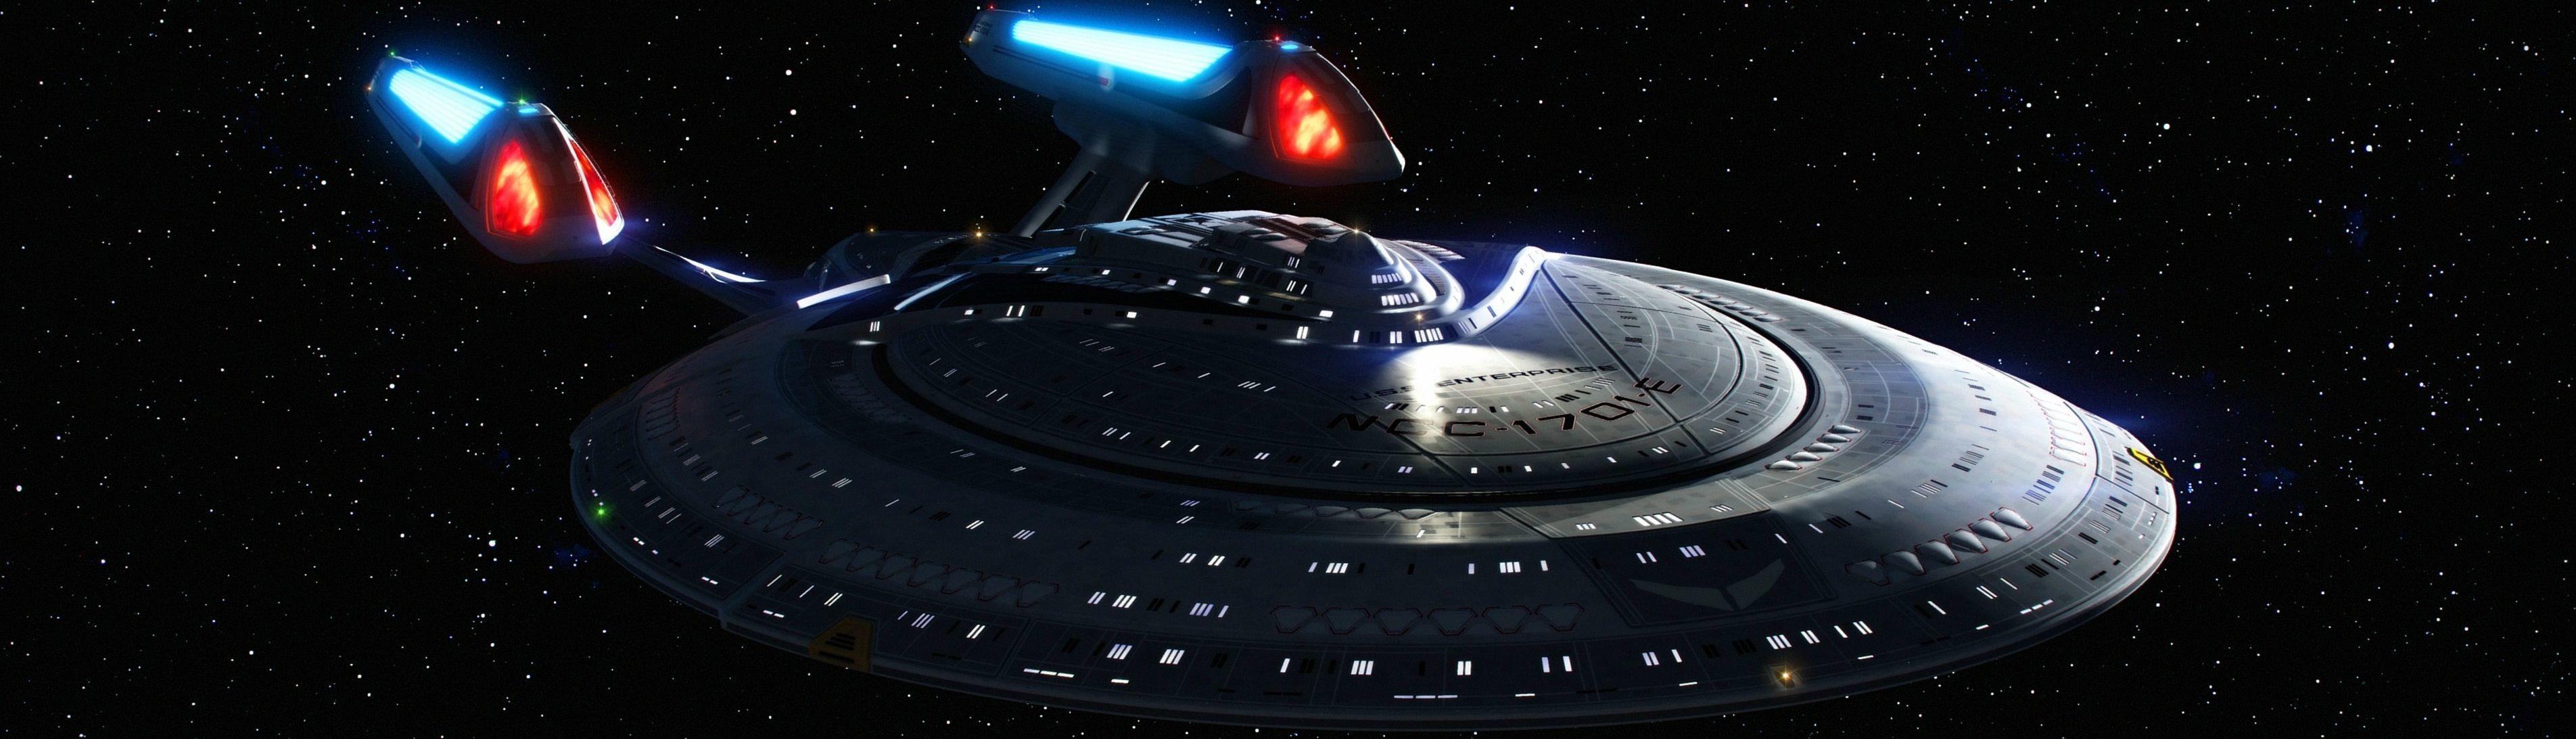 Enterprise E (Dual Screen Wallpaper)